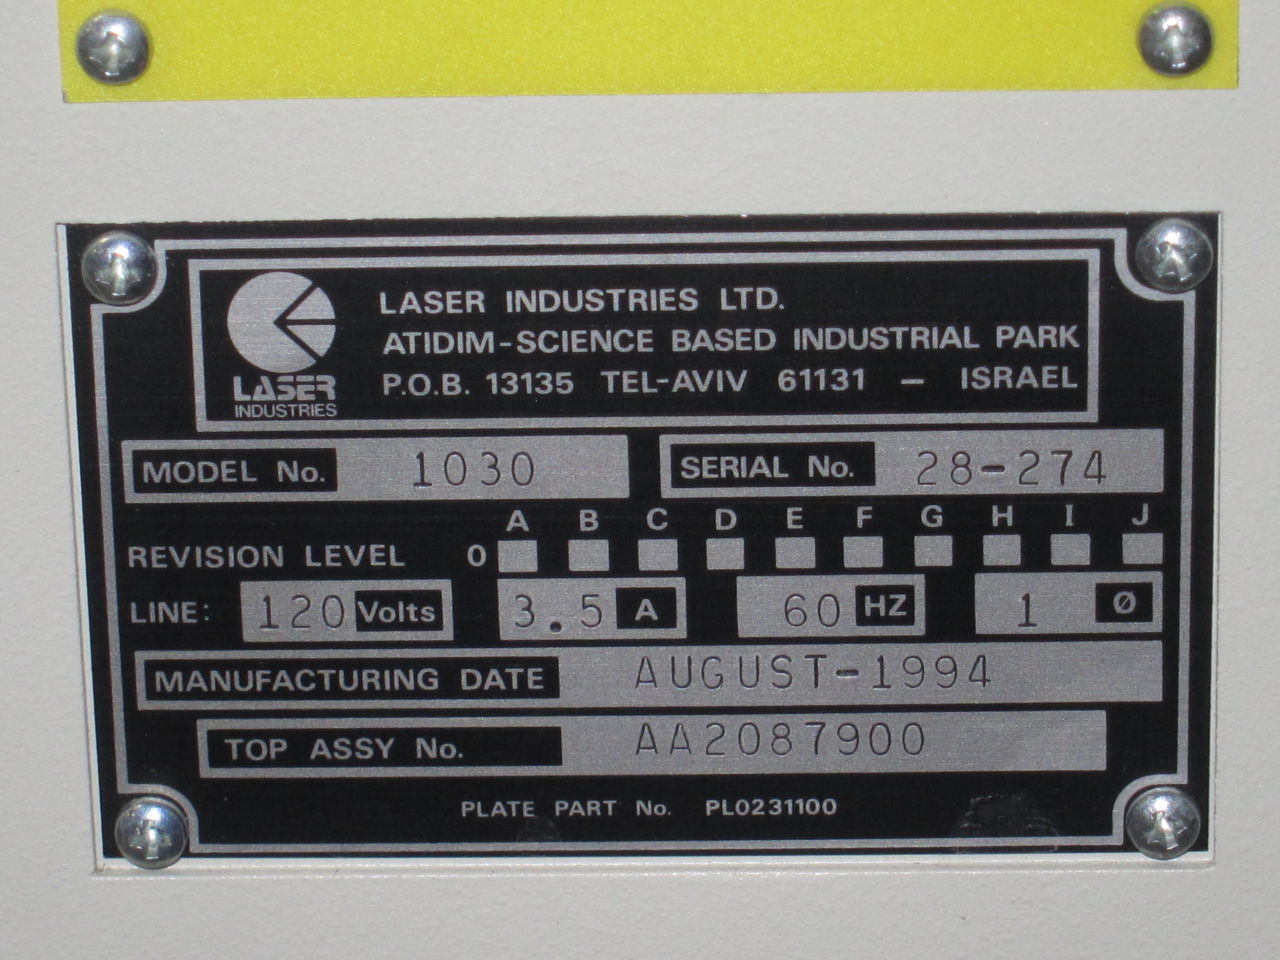 LASER INDUSTRIES Sharplan 1030 Surgical Laser